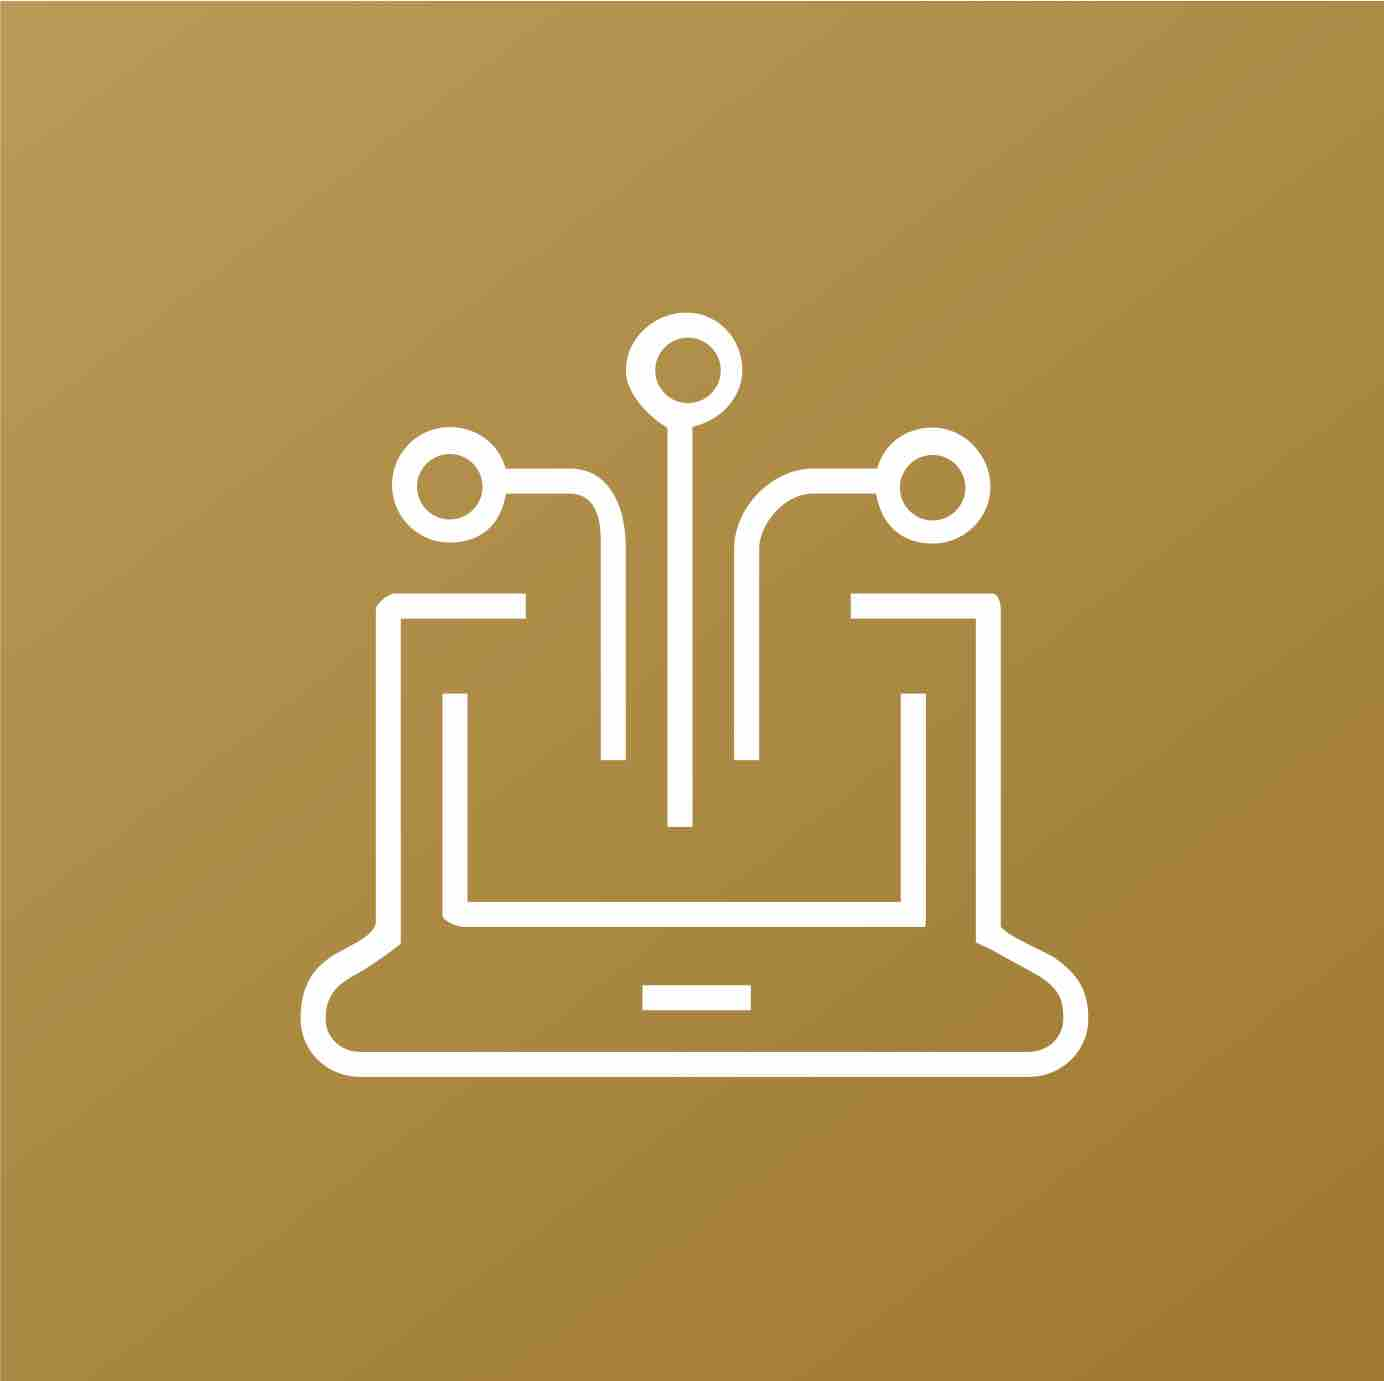 computer data icon.jpg